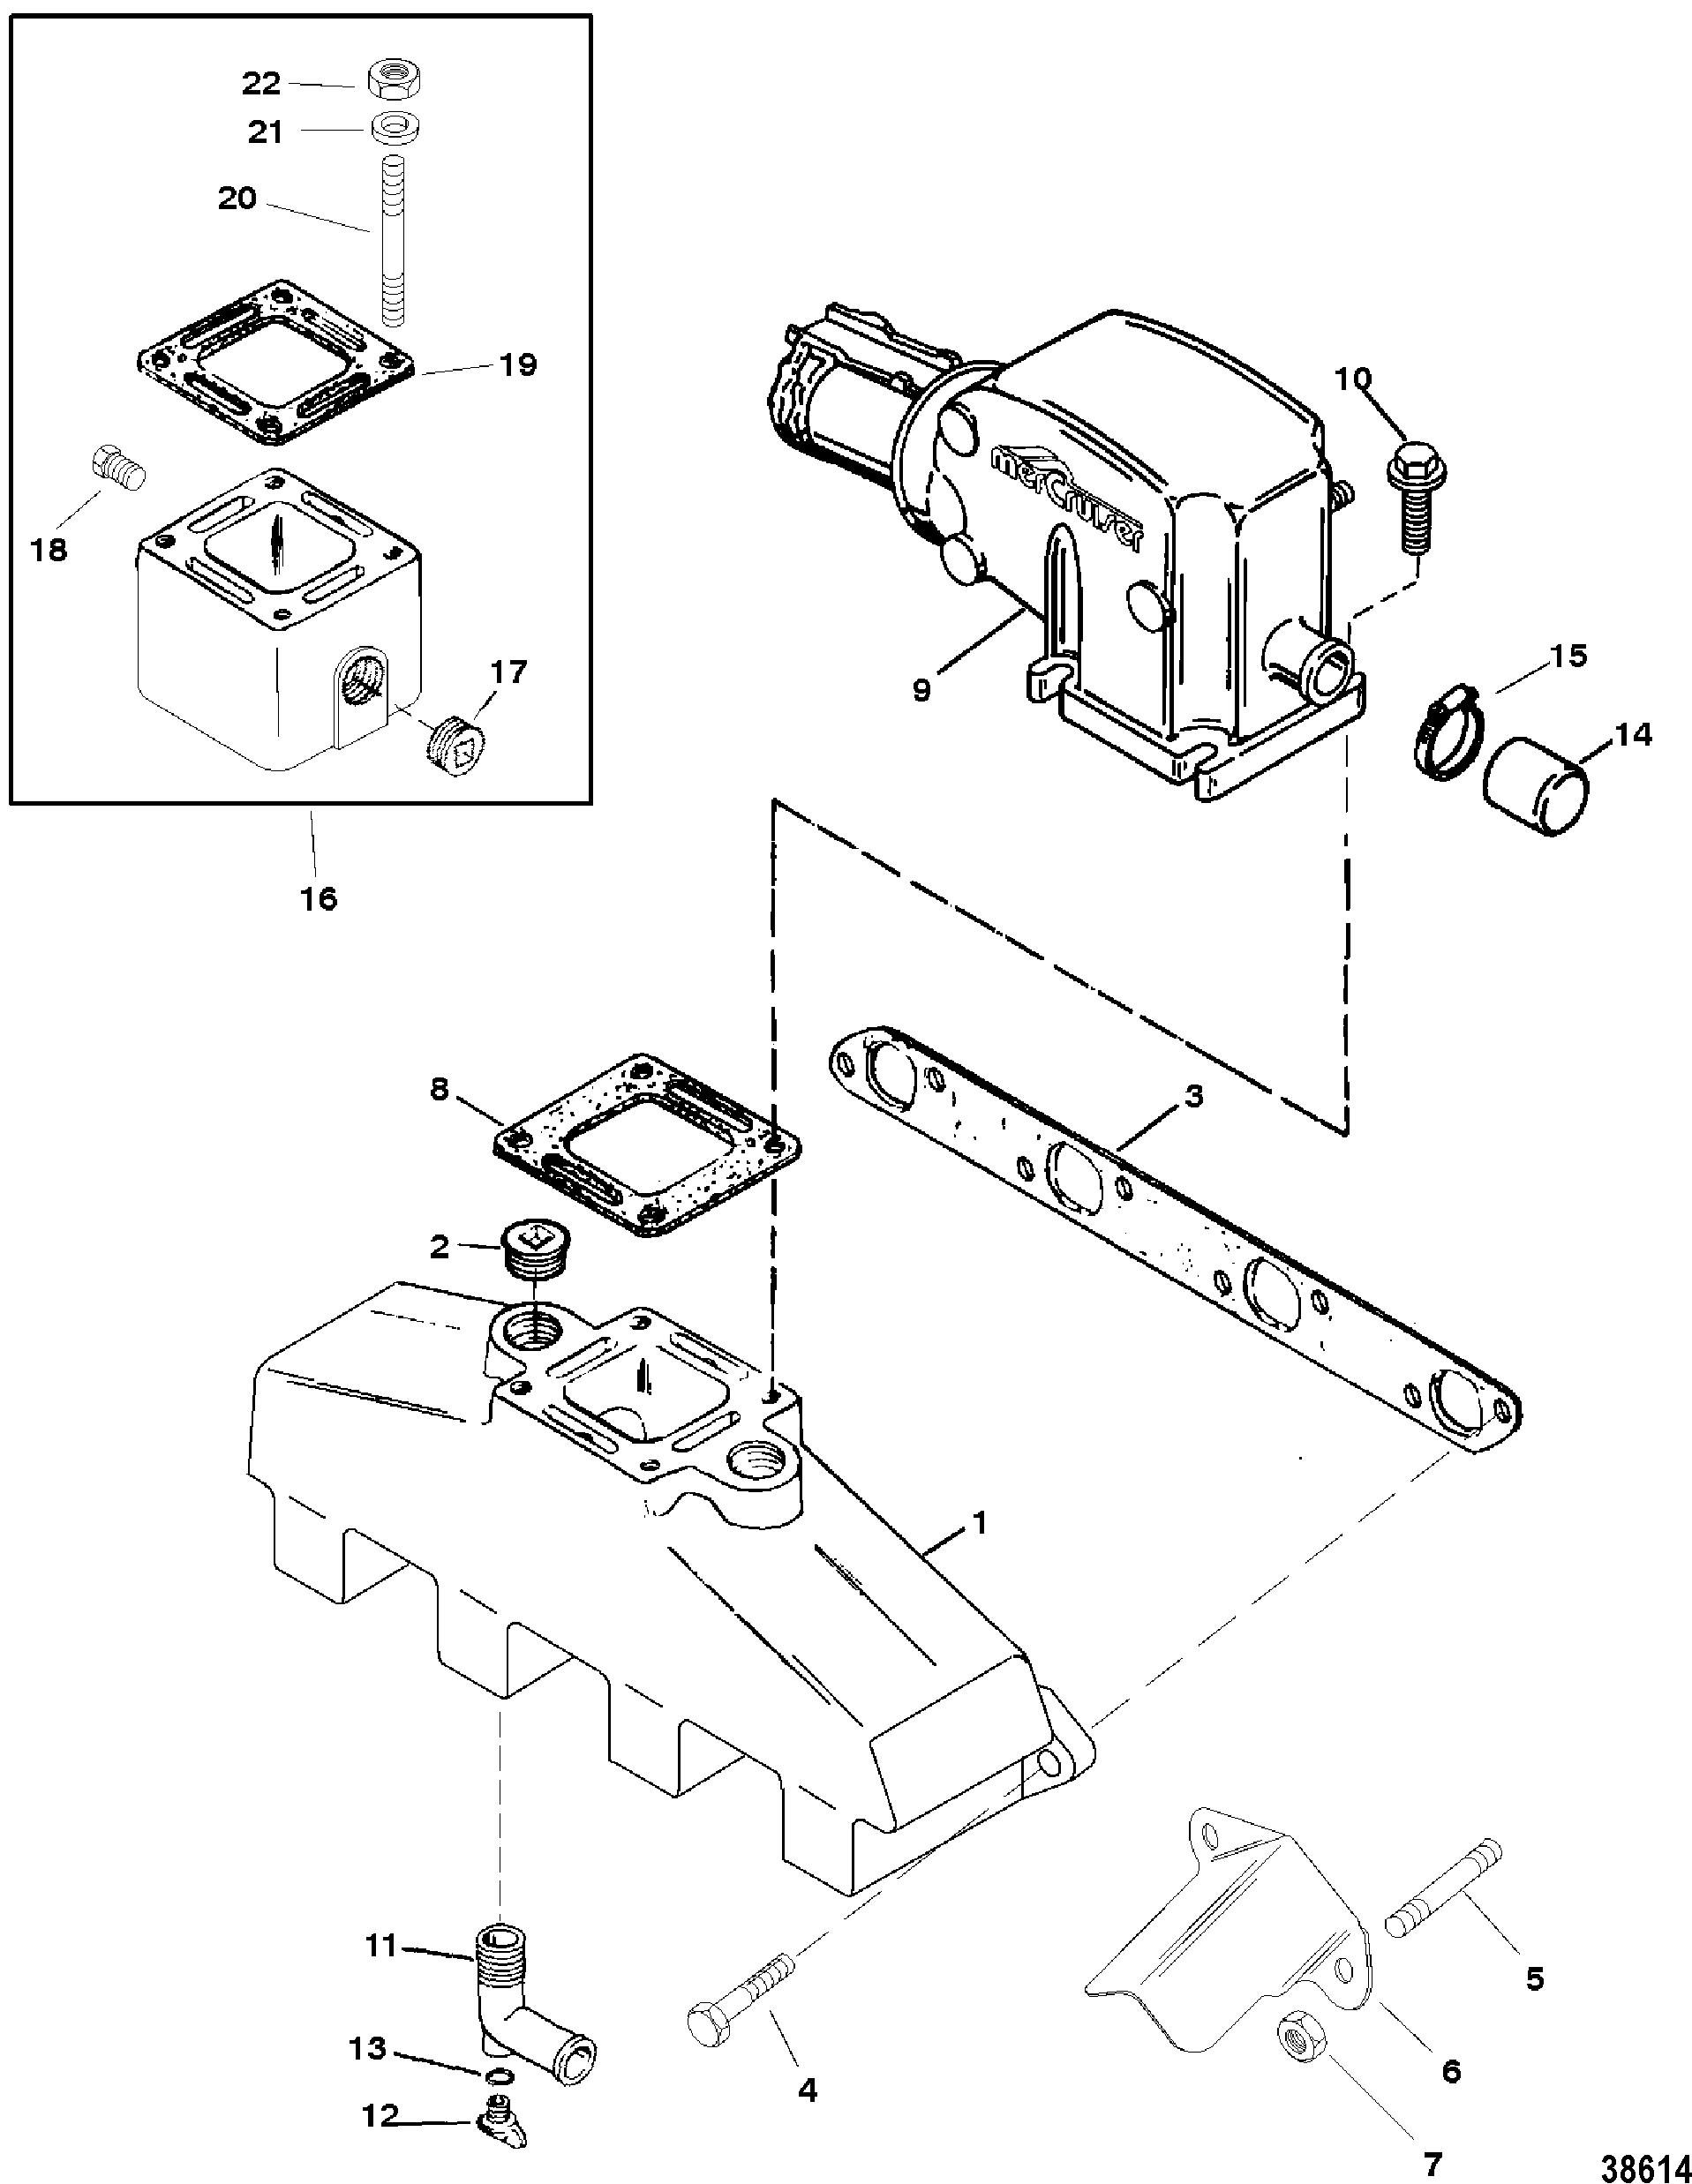 mercruiser 454 mag bravo mpi gen vi Mercruiser 2.5L 1988 Wiring Diagram exhaust manifold and exhaust elbow